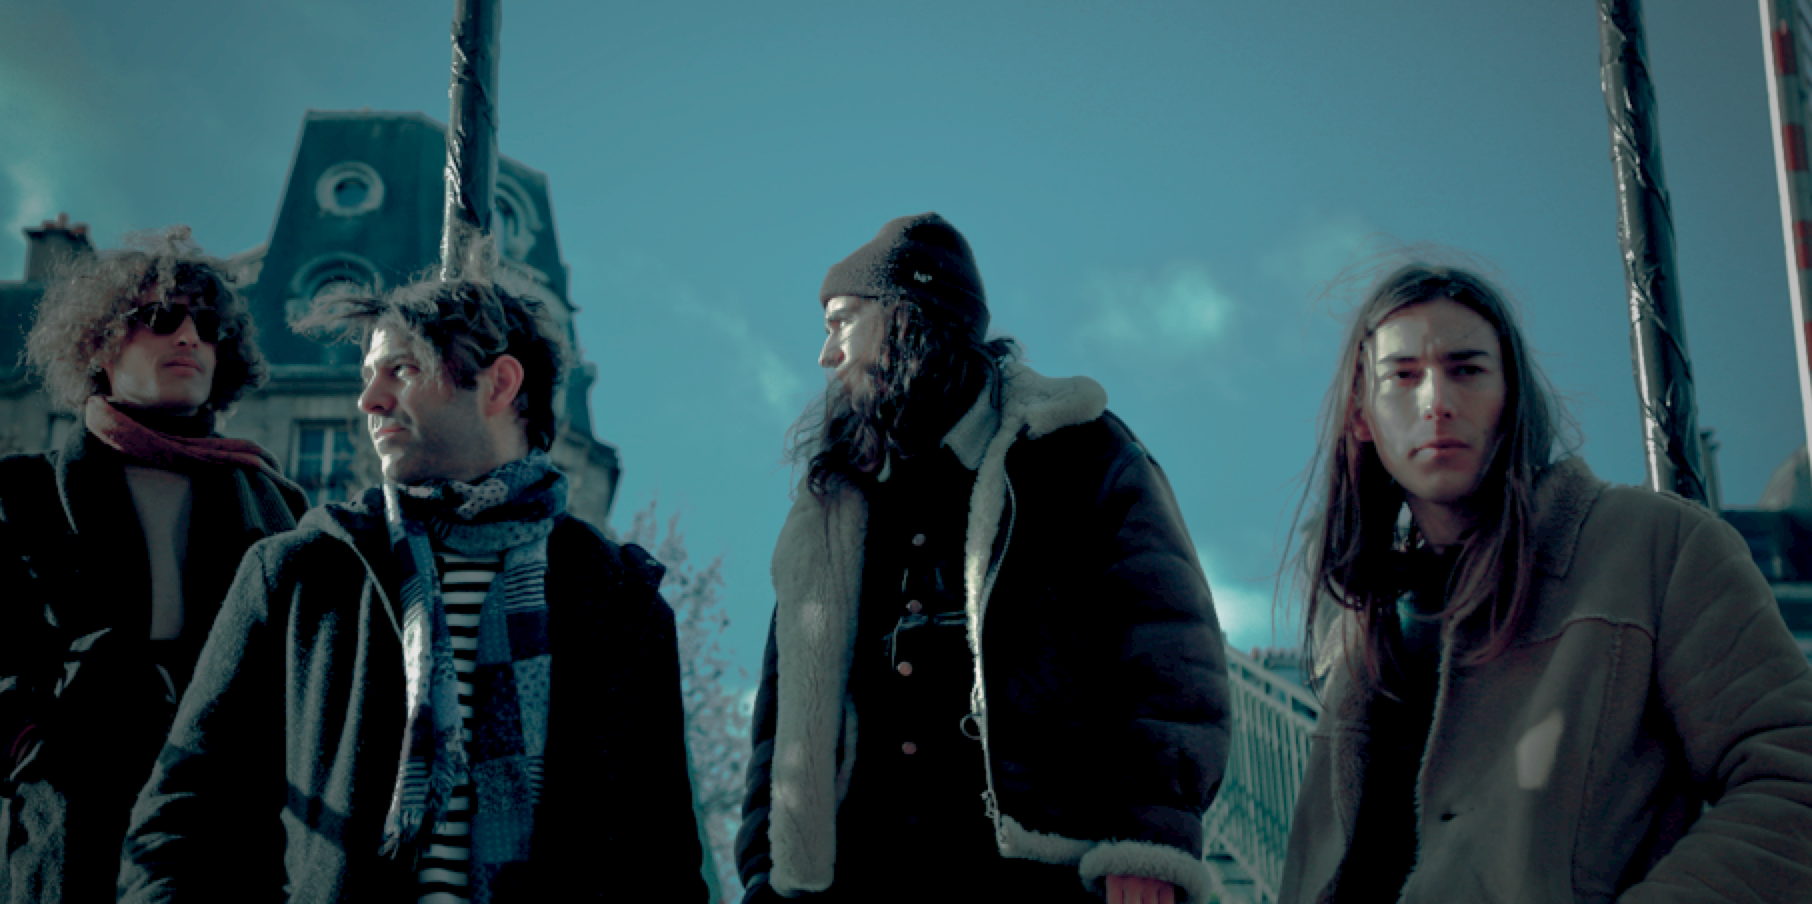 must listen-le roi angus-la wax-France-Switzerland-indie music-indie rock-new music-music blog-indie blog-wolfinasuit-wolf in a suit